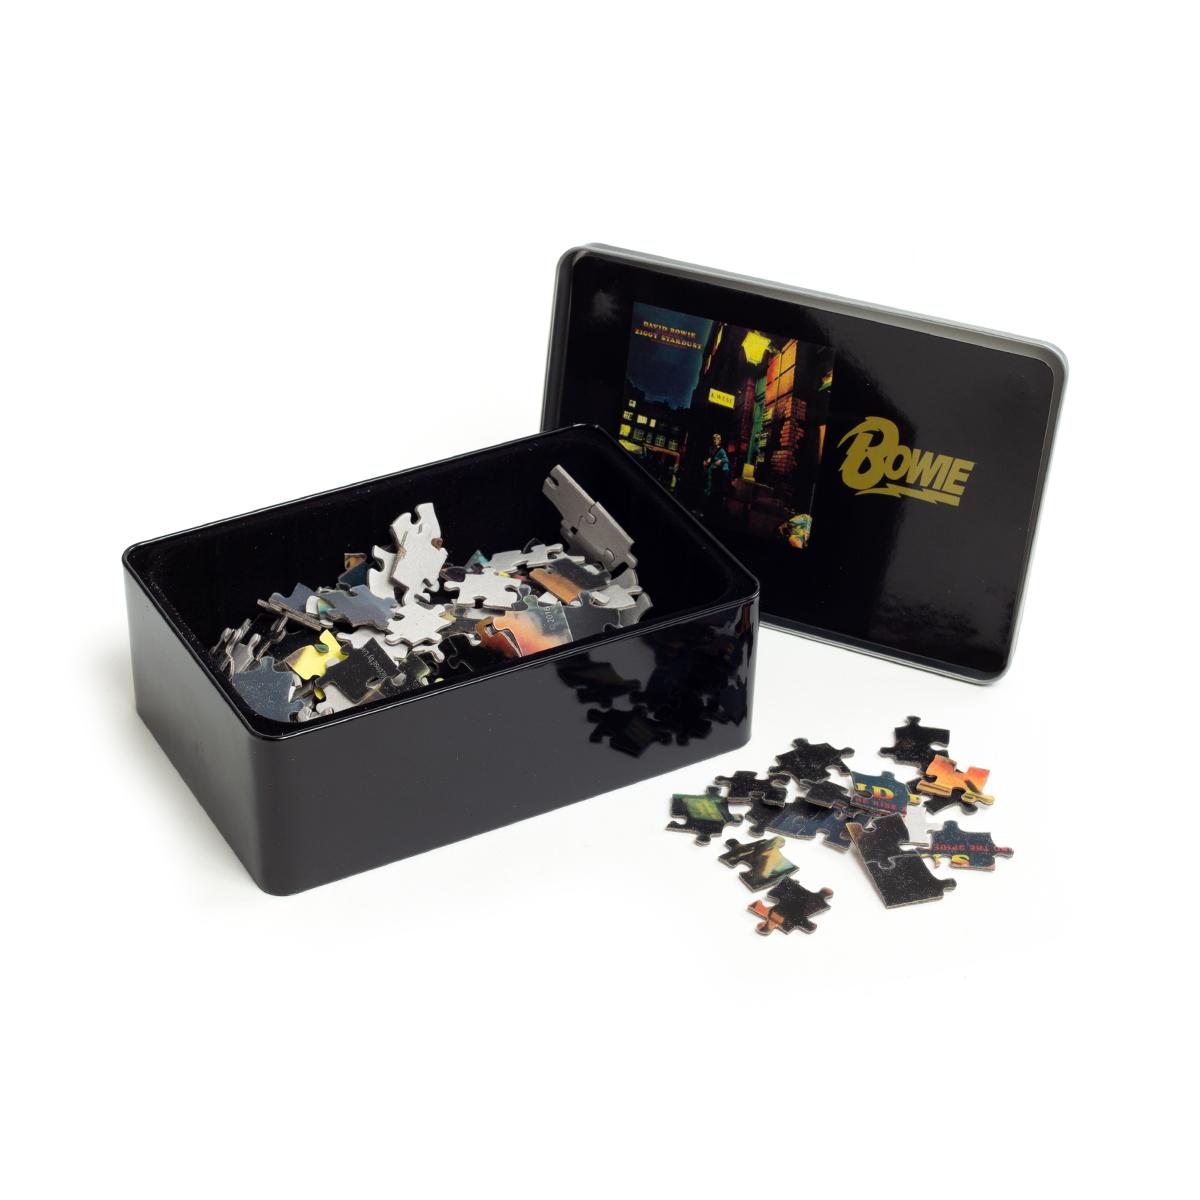 Bowie Ziggy Stardust 3D Jigsaw Puzzle